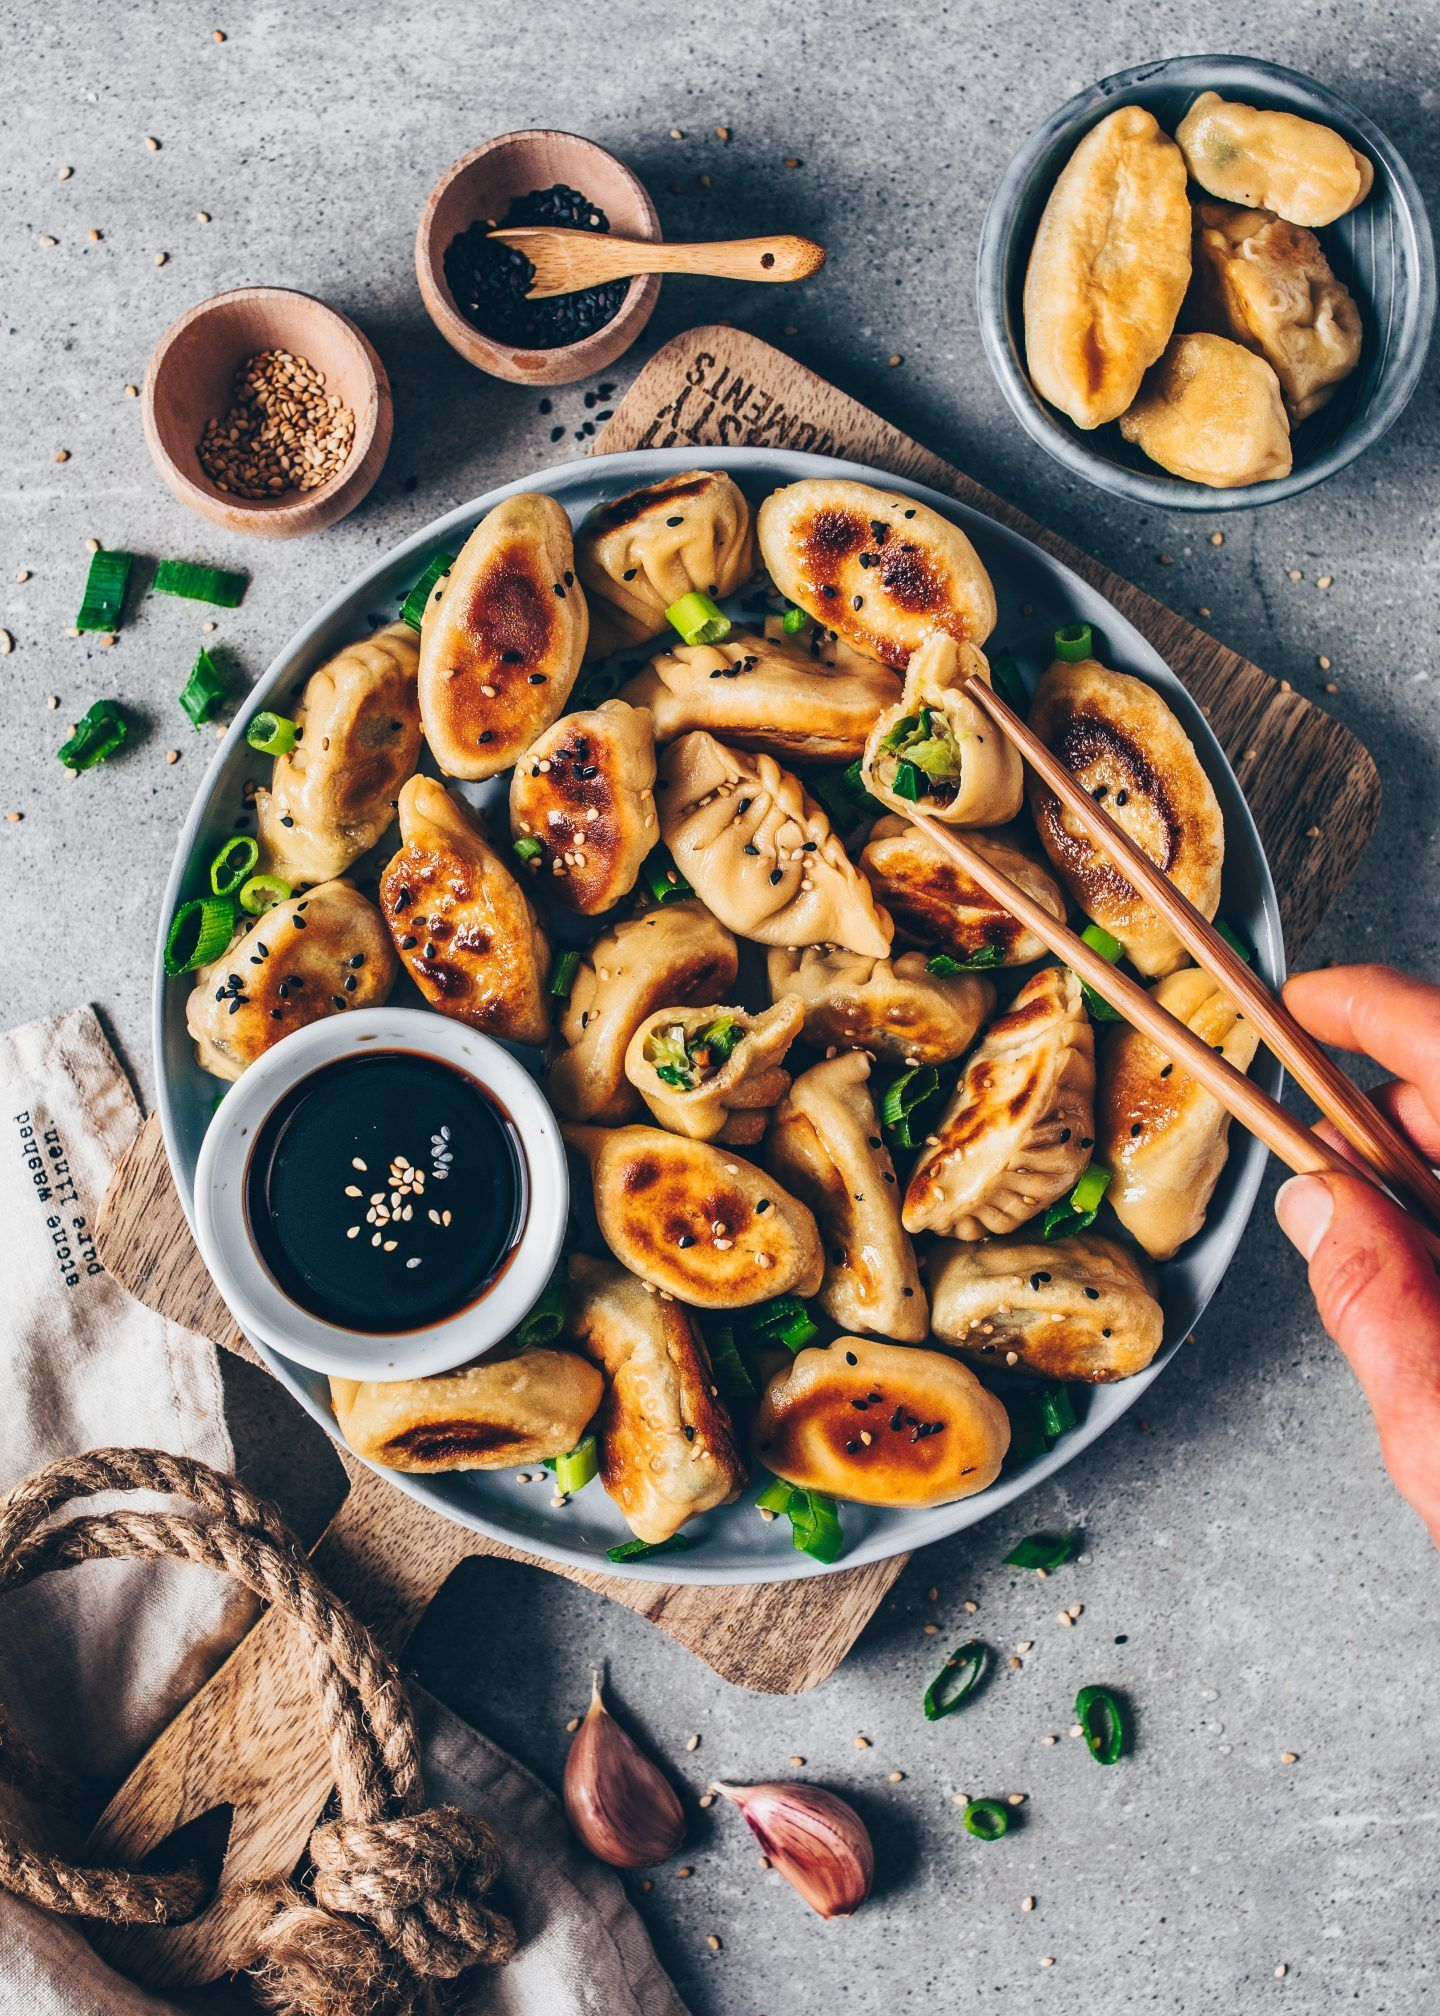 Vegan Dumplings (Gyoza with Vegetable Filling) - Bianca Zapatka | Recipes#bianca #dumplings #filling #gyoza #recipes #vegan #vegetable #zapatka